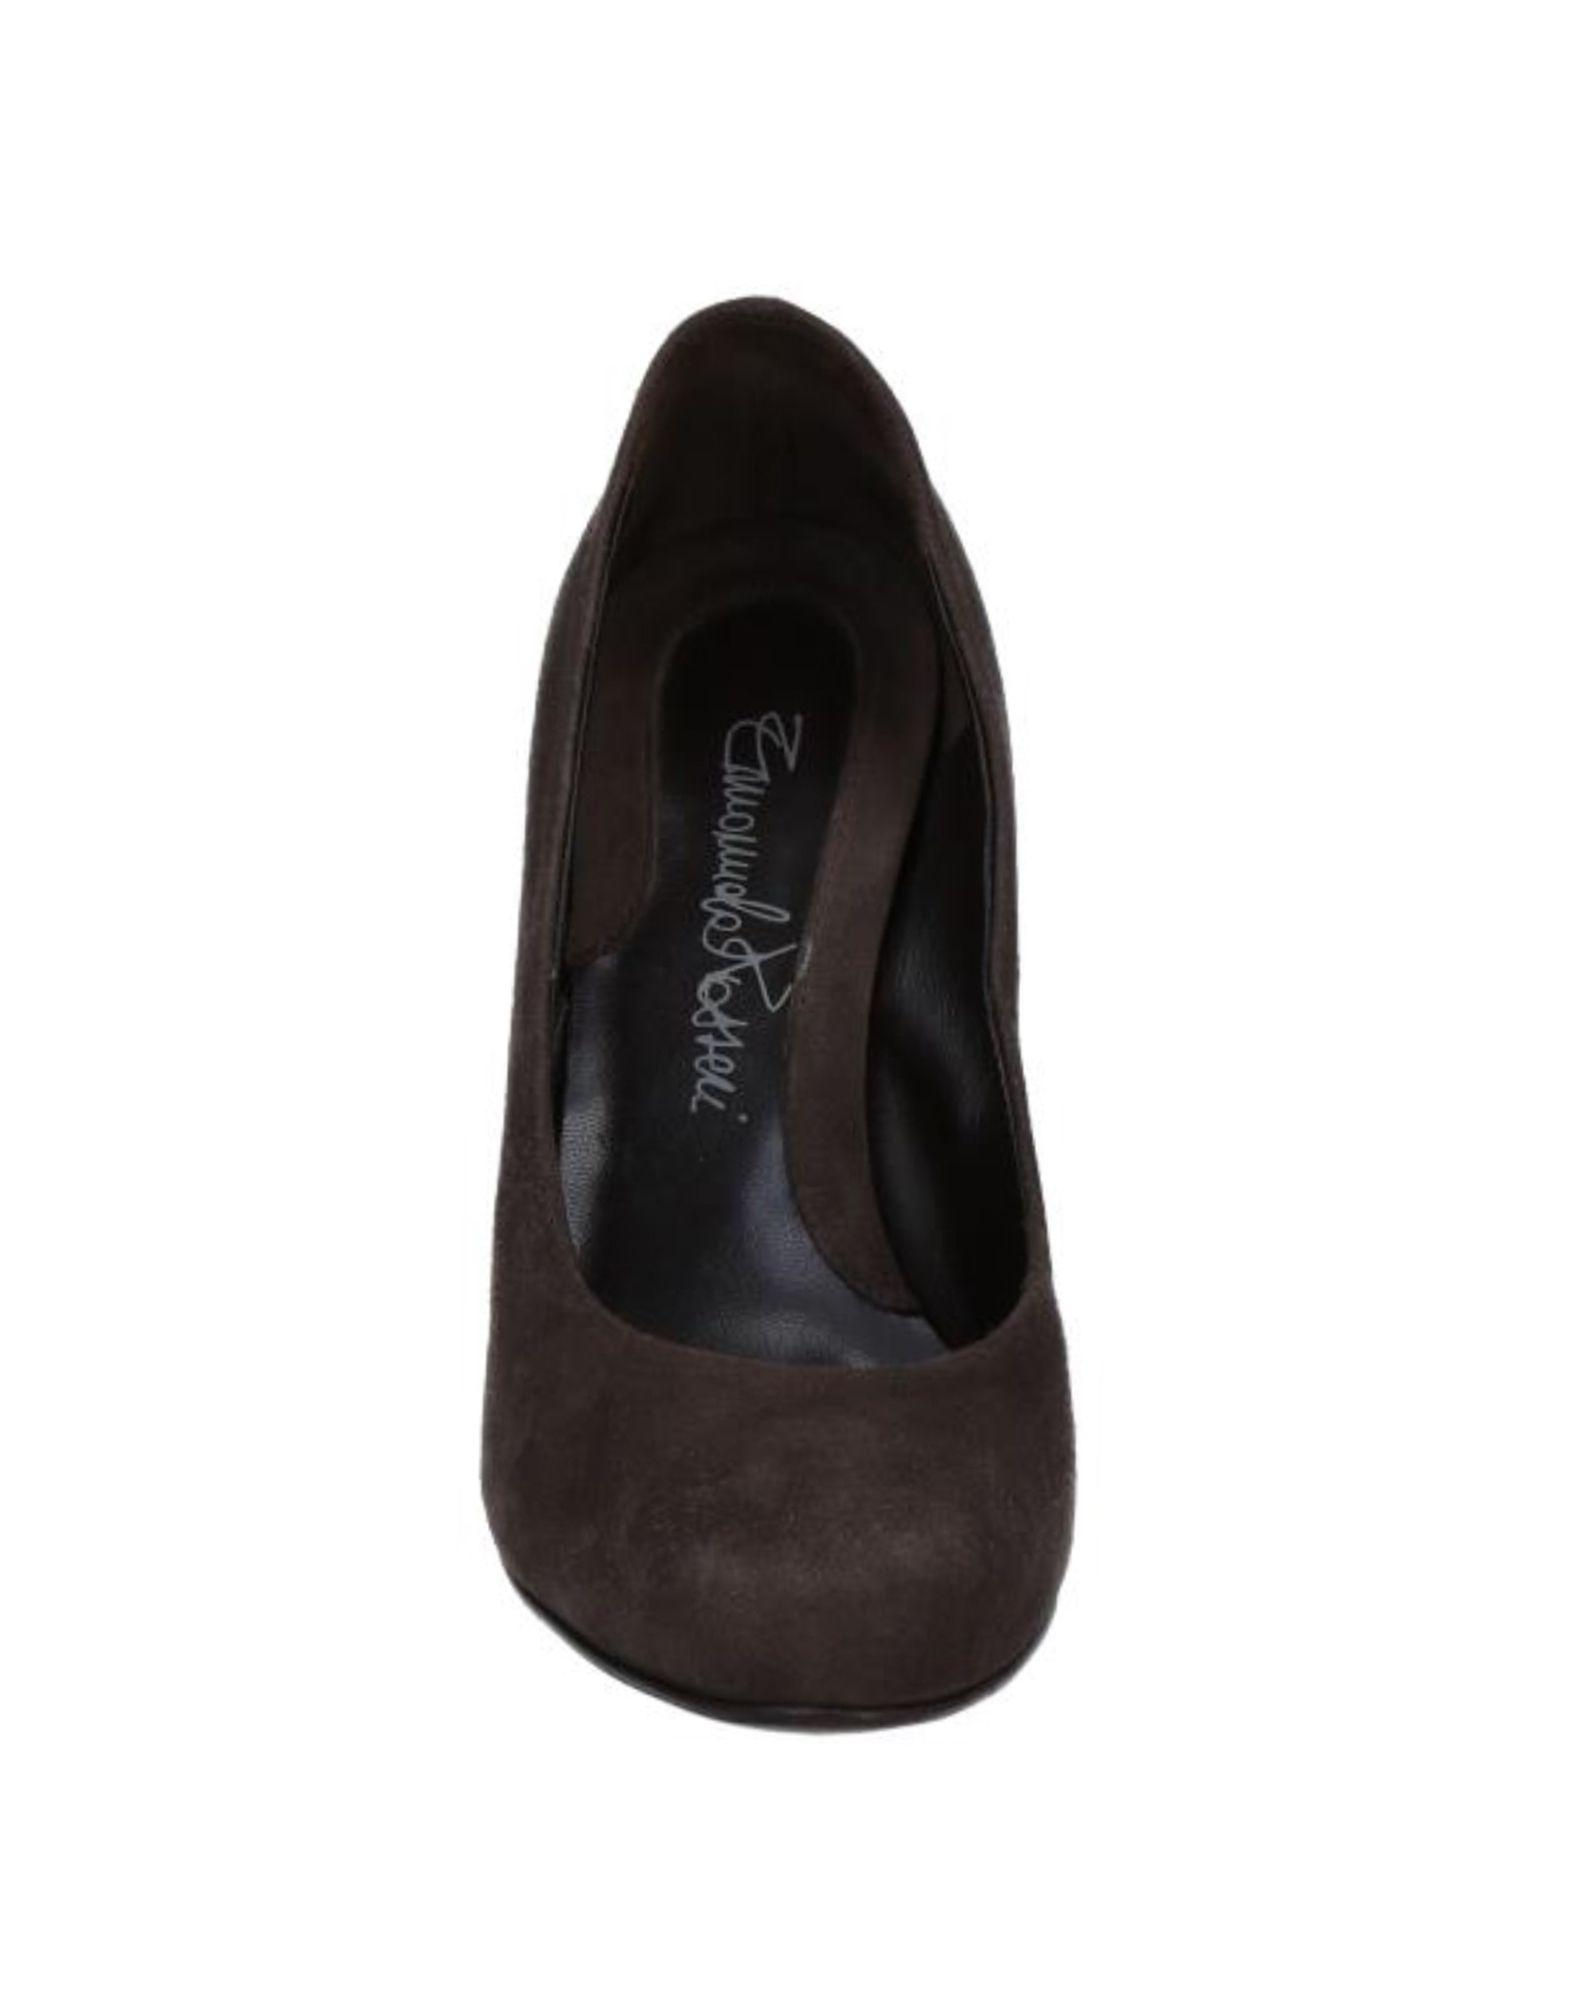 Emanuela 11538977TG Passeri Pumps Damen  11538977TG Emanuela Gute Qualität beliebte Schuhe c83b07